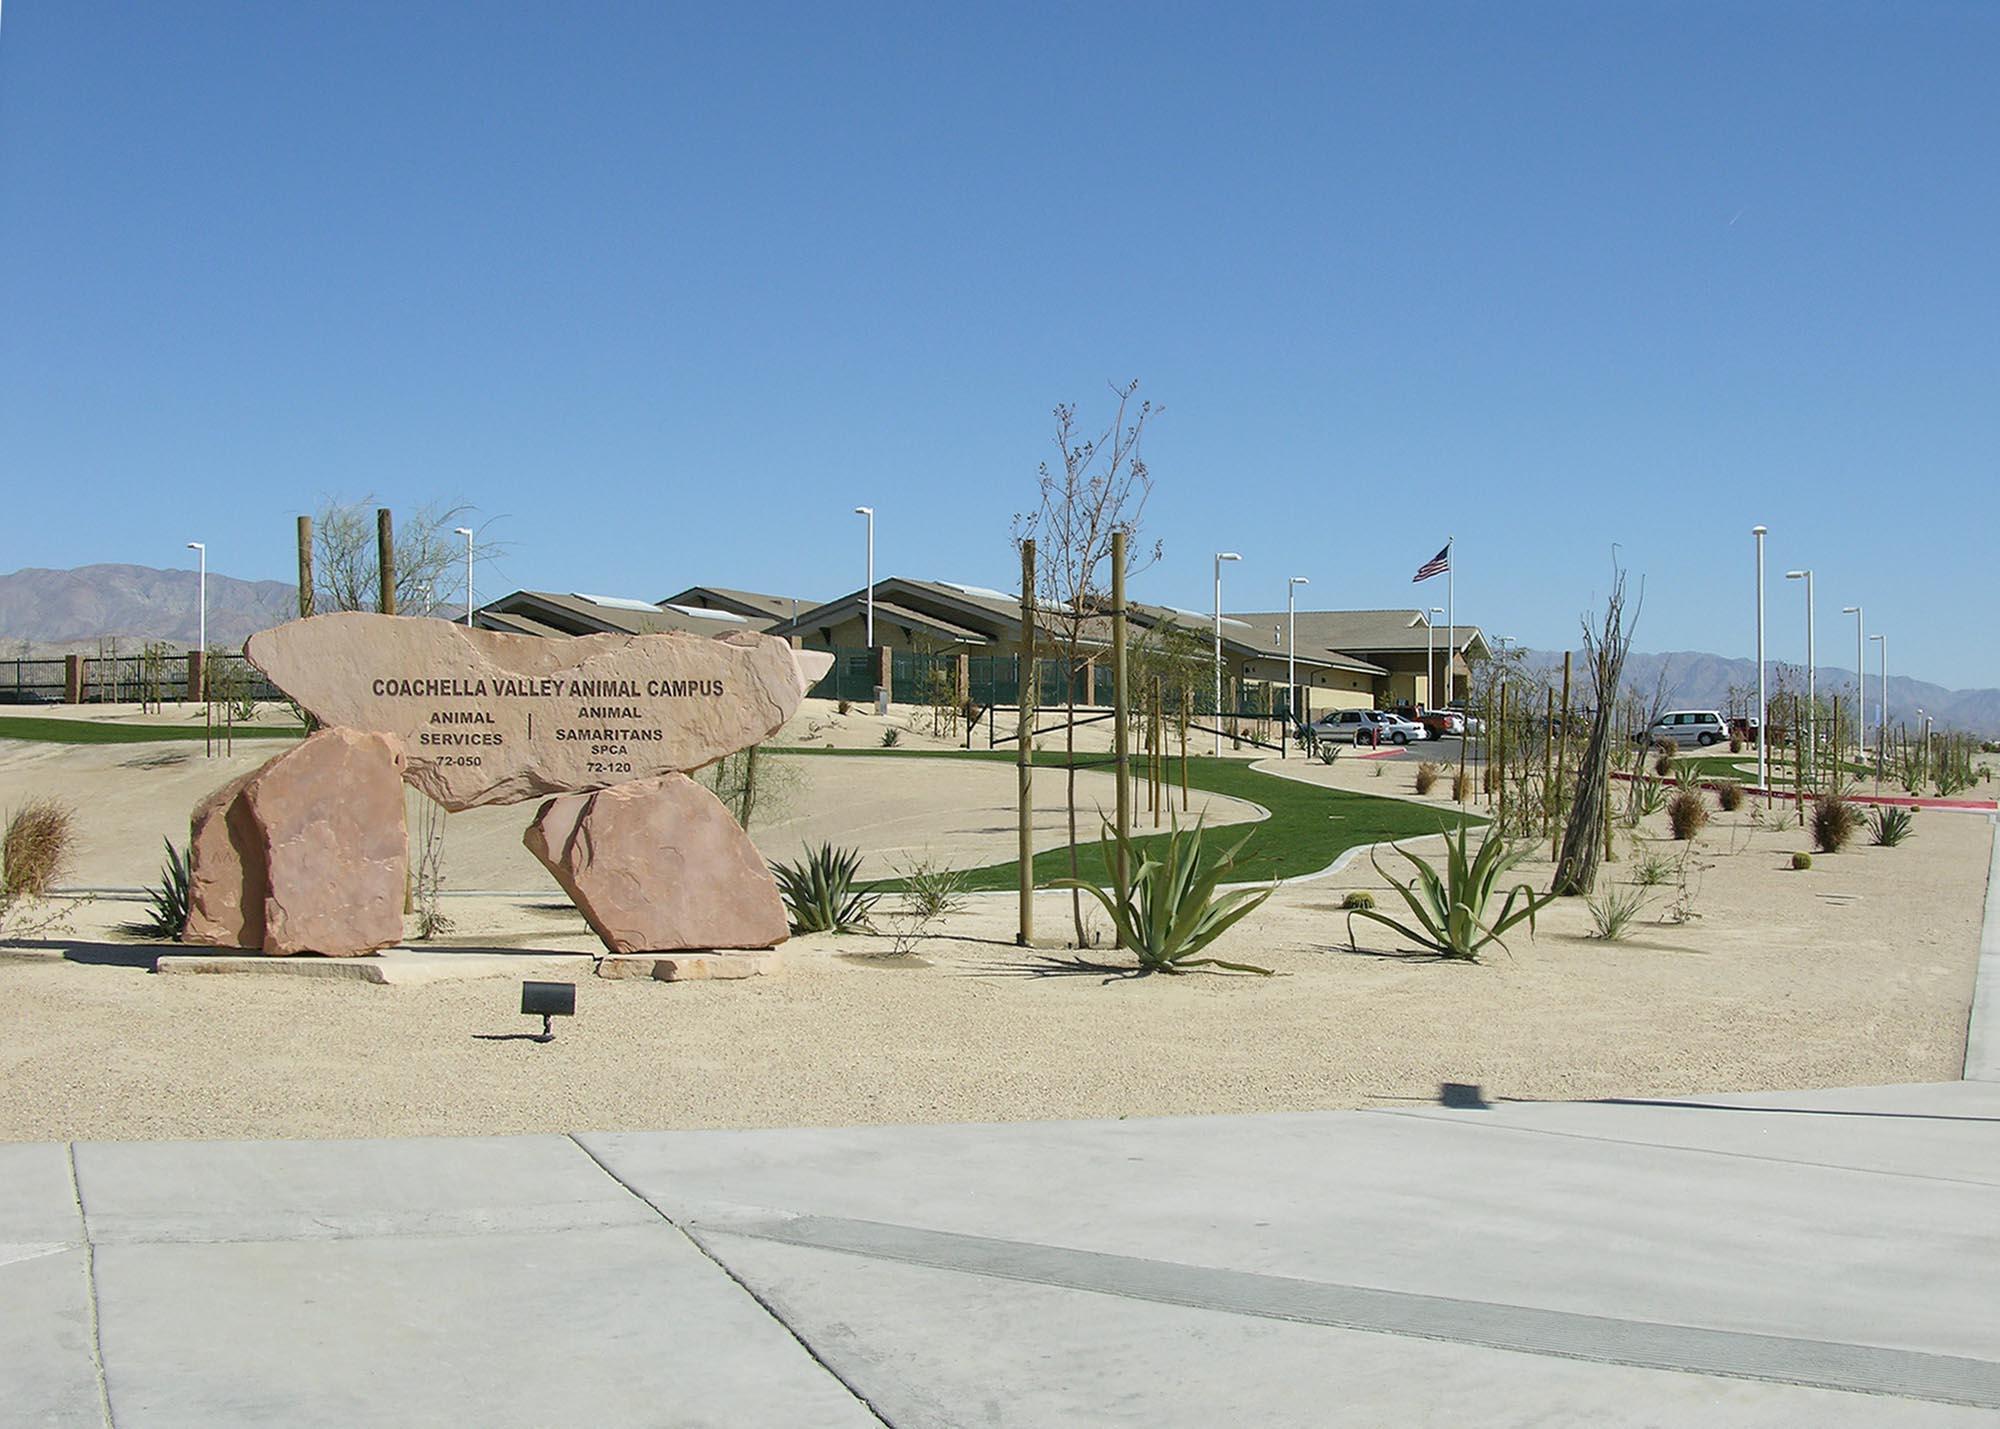 Coachella-Valley-Animal-Campus03.jpg